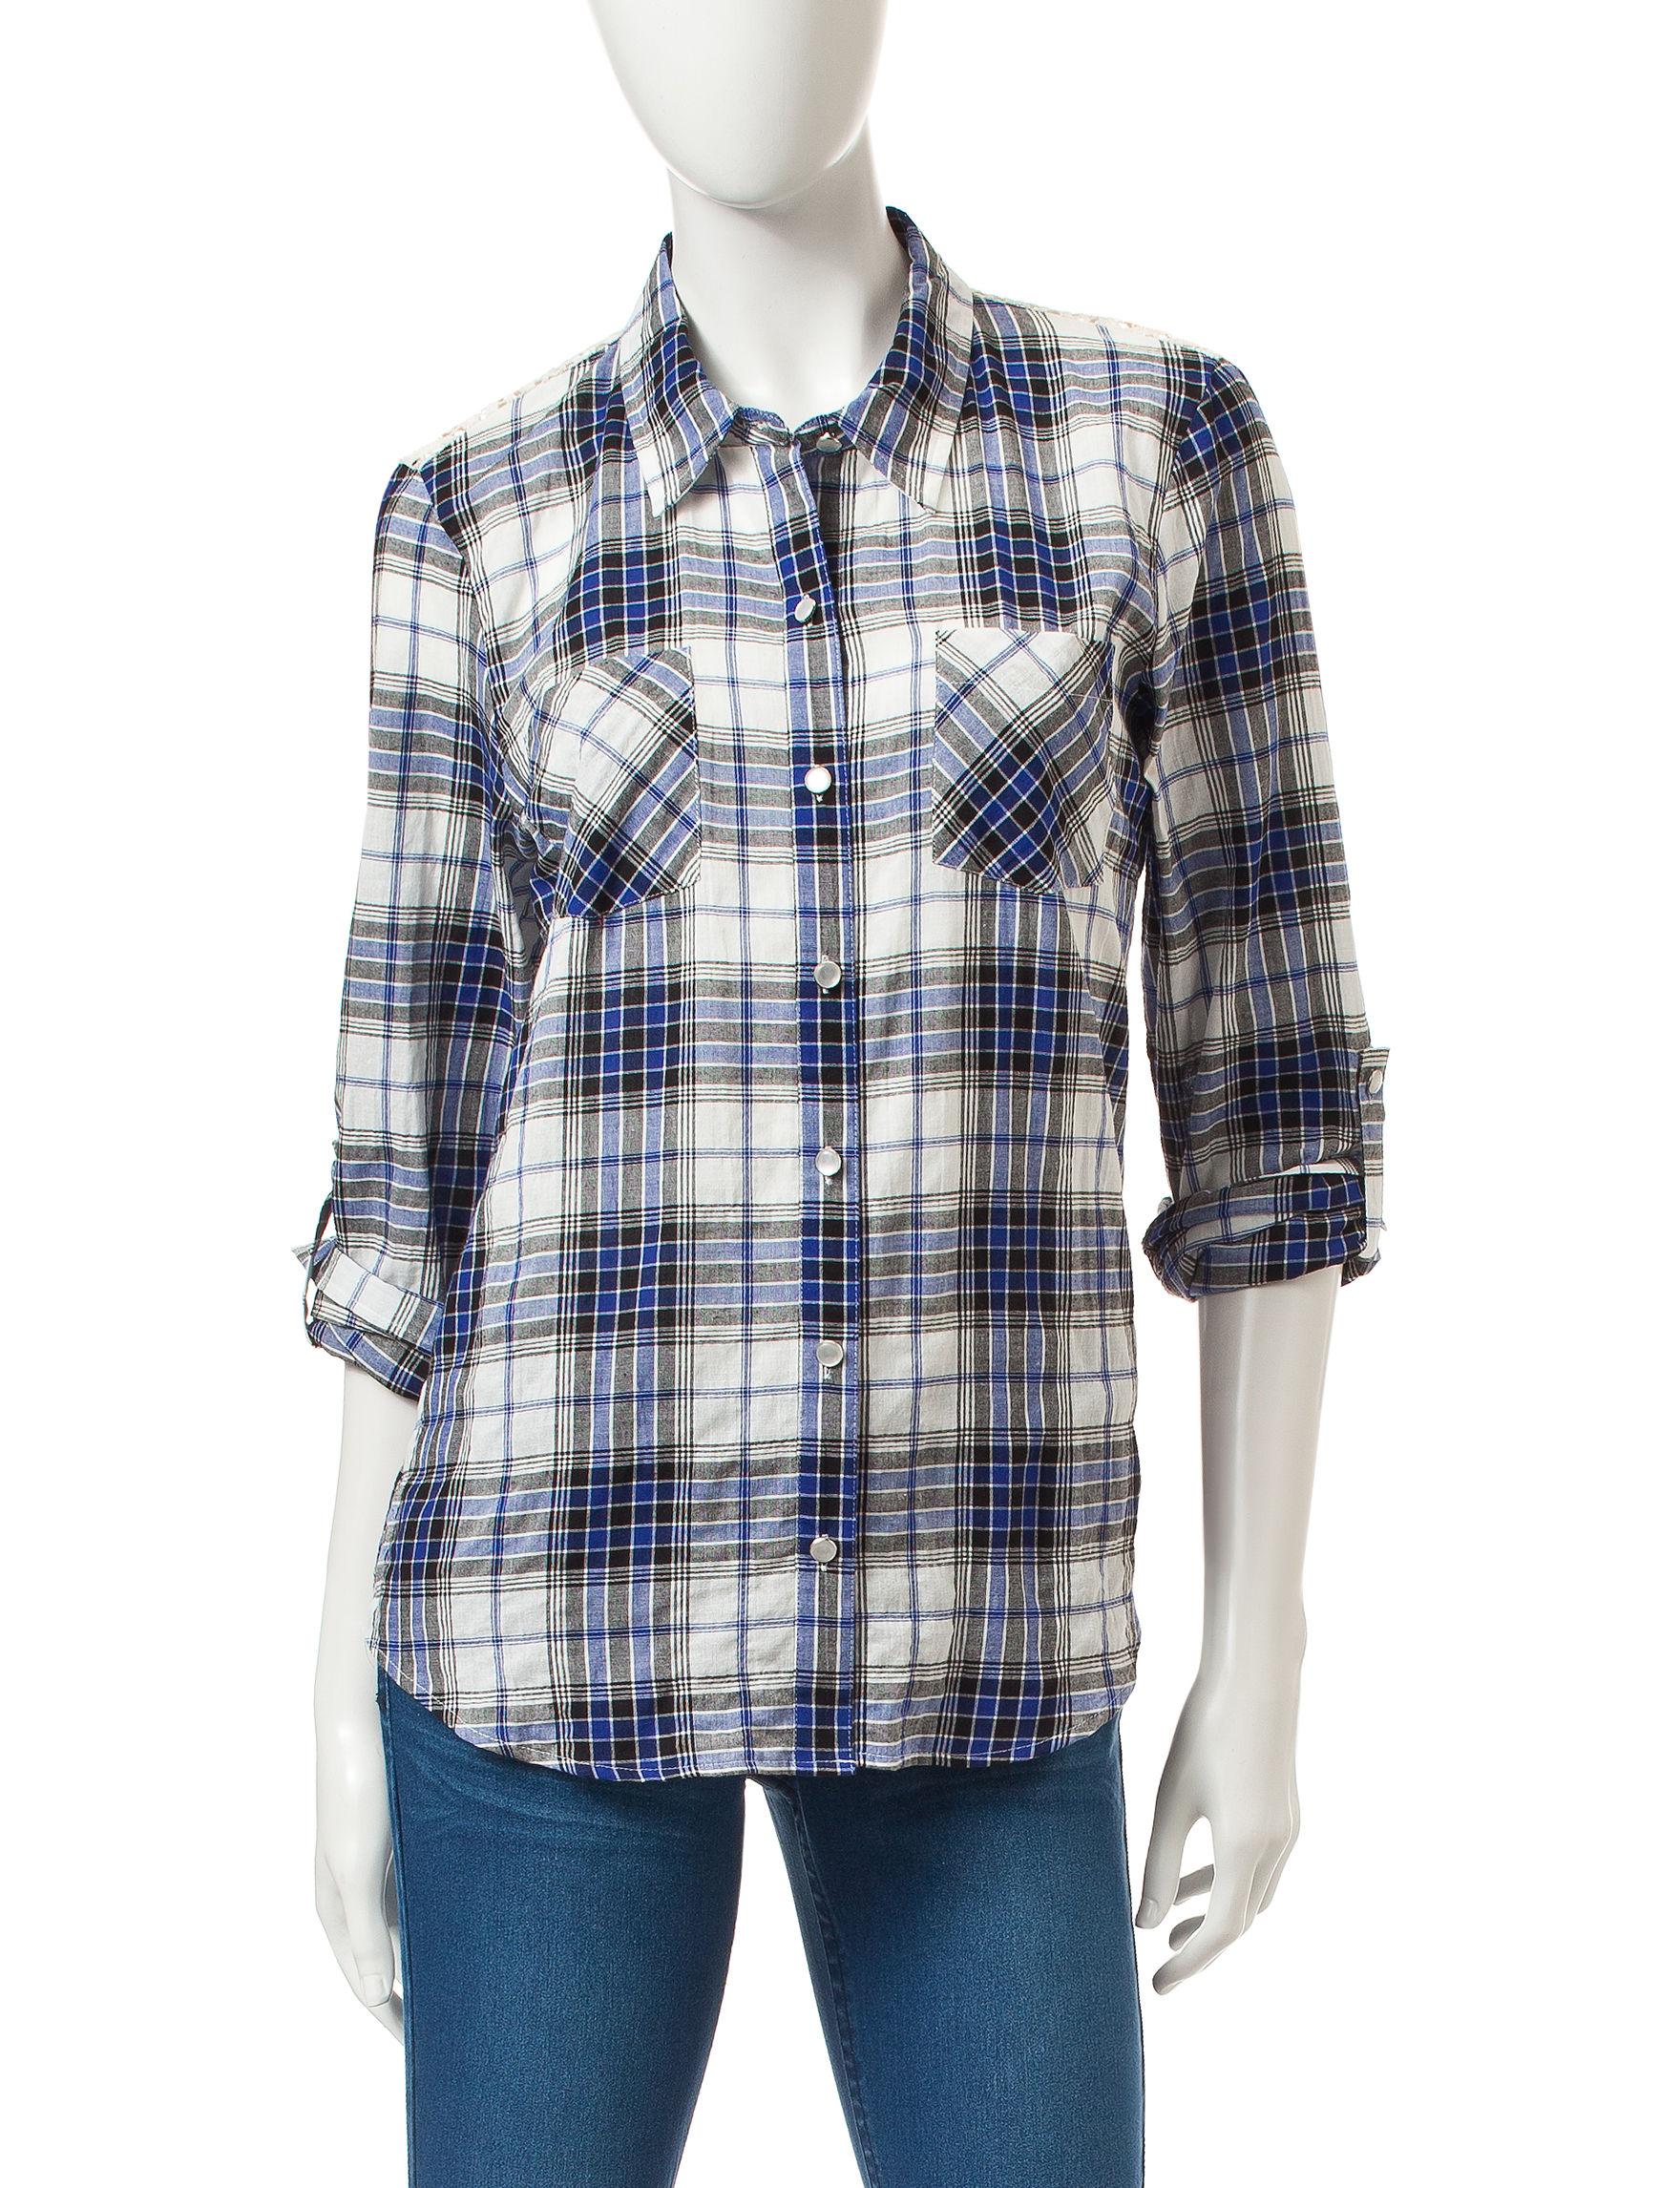 My Michelle White / Blue / Black Shirts & Blouses